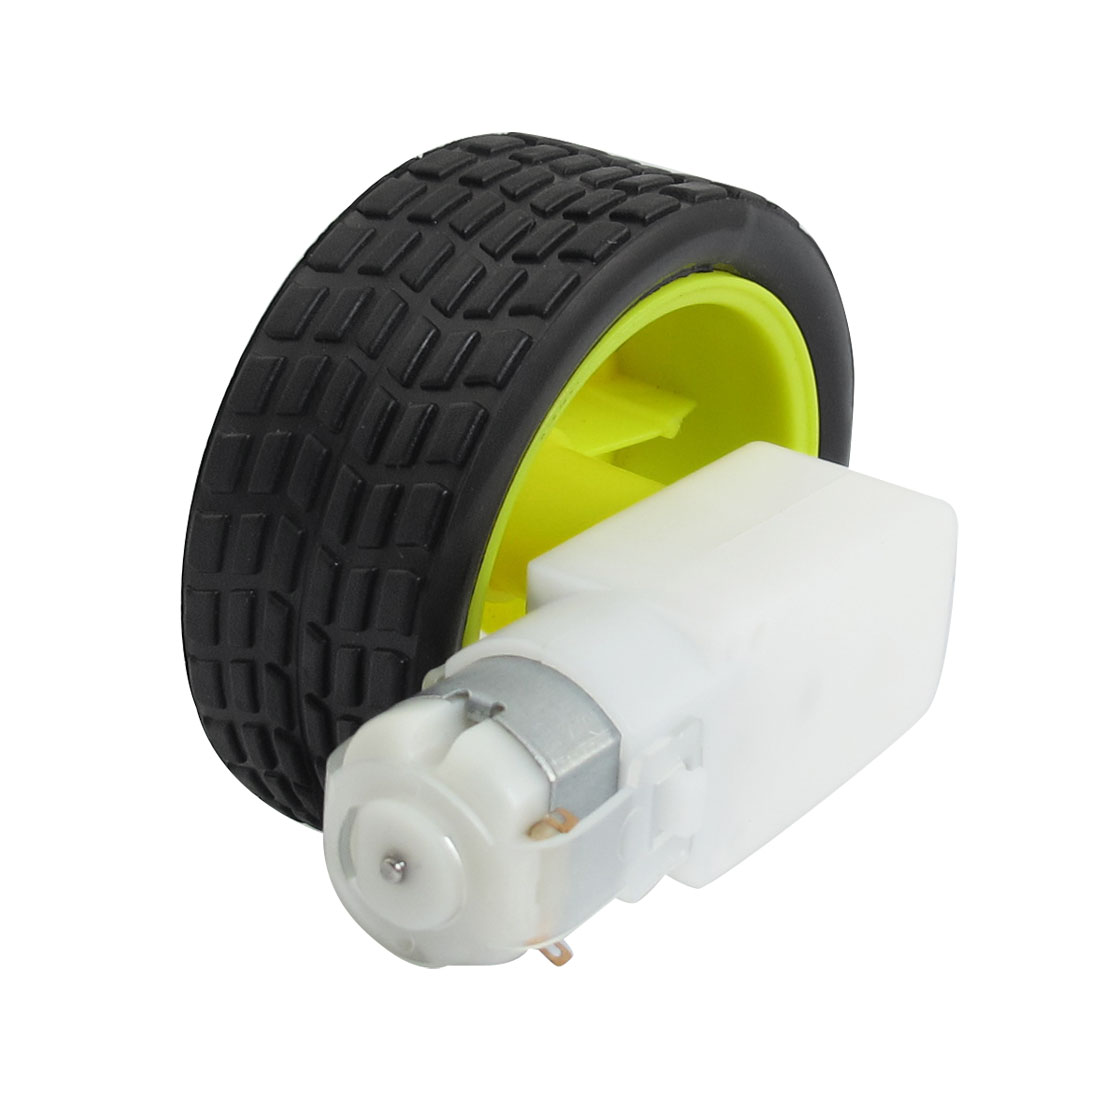 15RPM-3V-Monoaxial-DC-Geared-Motor-w-Plastic-Tire-Wheel-for-DIY-Robot-Smart-Car